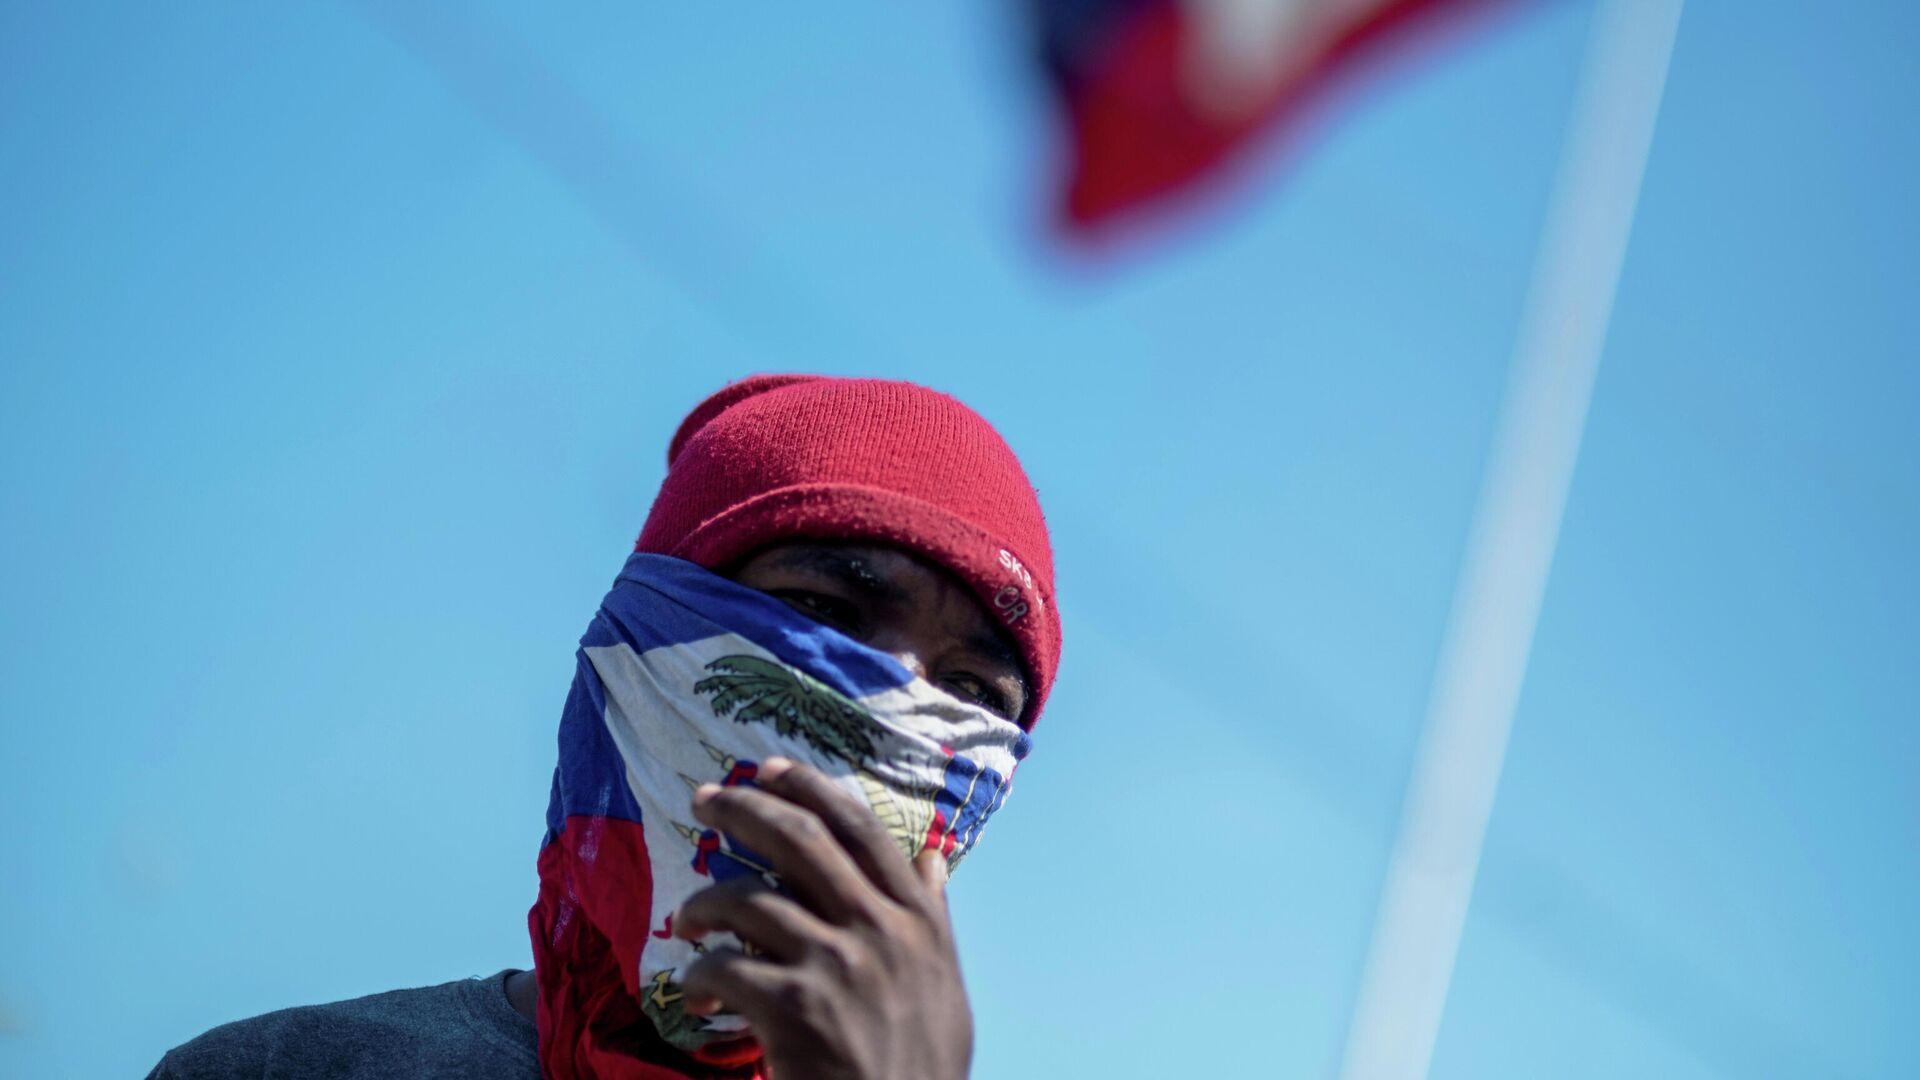 Manifestante en Haití - Sputnik Mundo, 1920, 06.08.2021